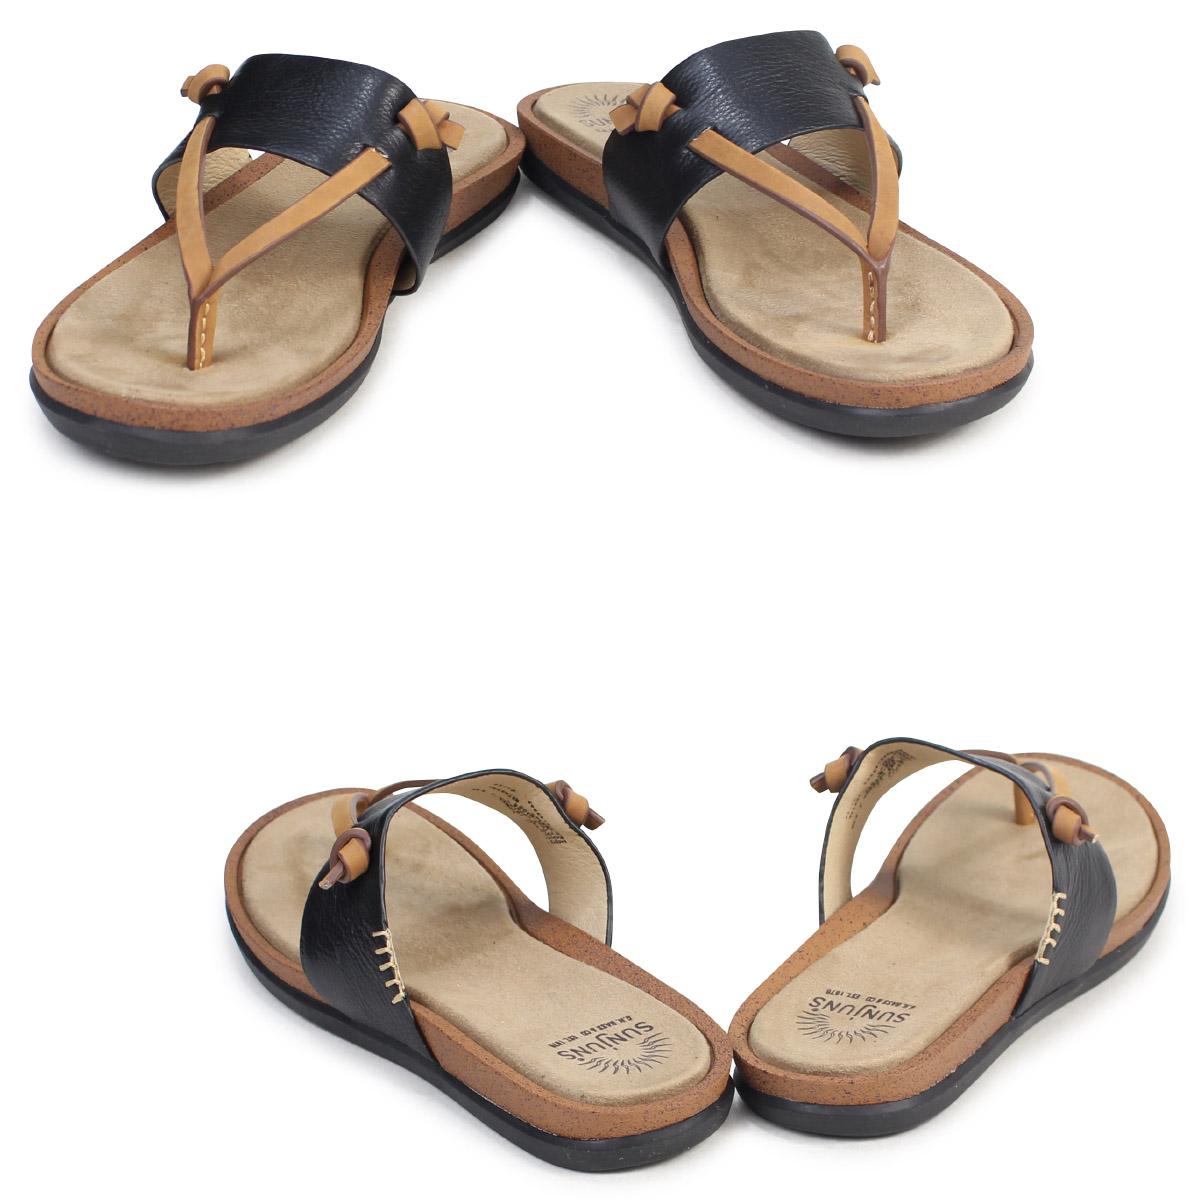 2ba1f9786ff ALLSPORTS  G H bus sandals Lady s G.H. BASS tong SHANNON THONG ...